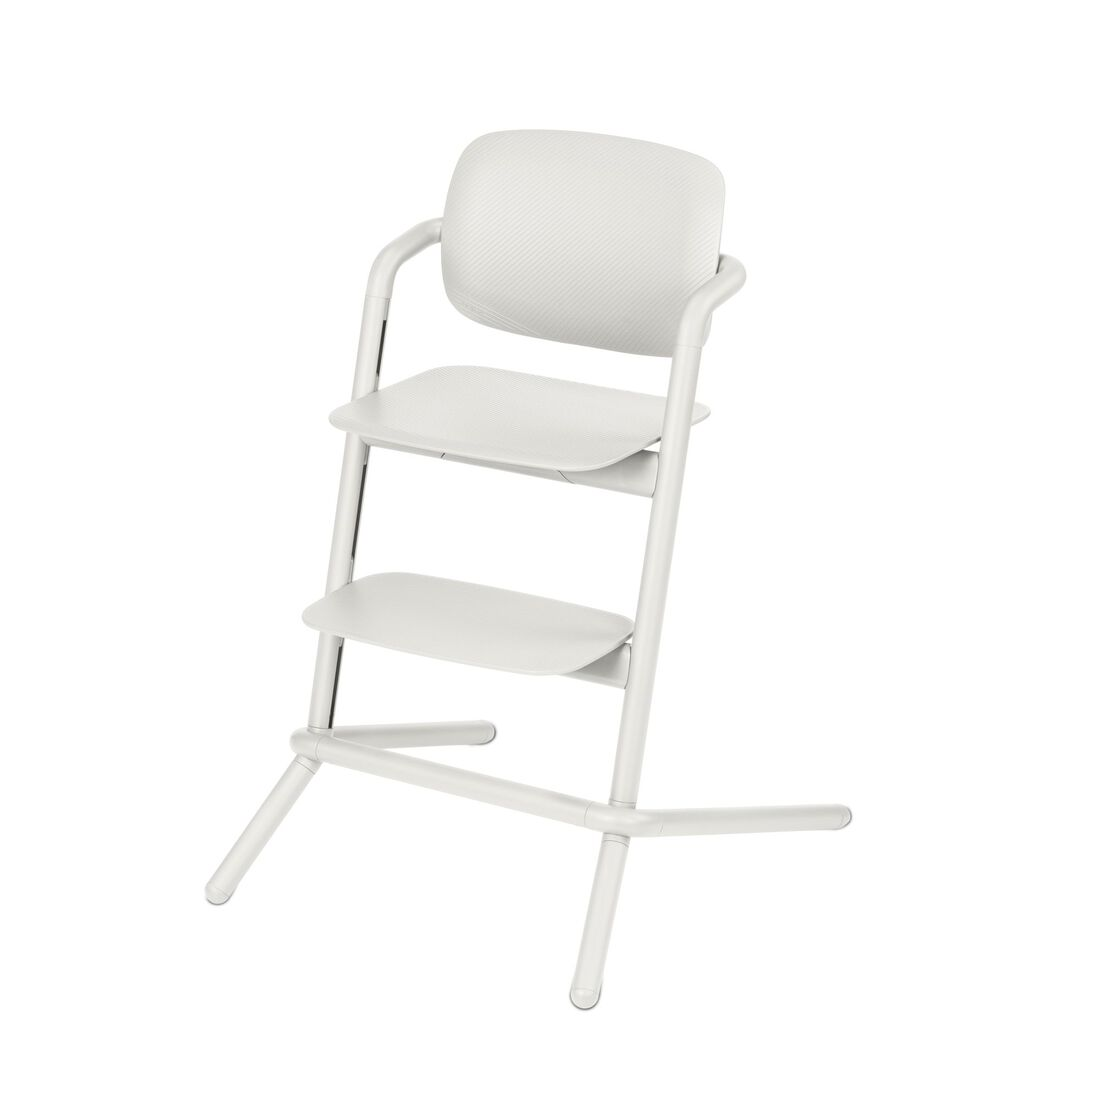 CYBEX Lemo Chair - Porcelaine White (Plastic) in Porcelaine White (Plastic) large image number 1